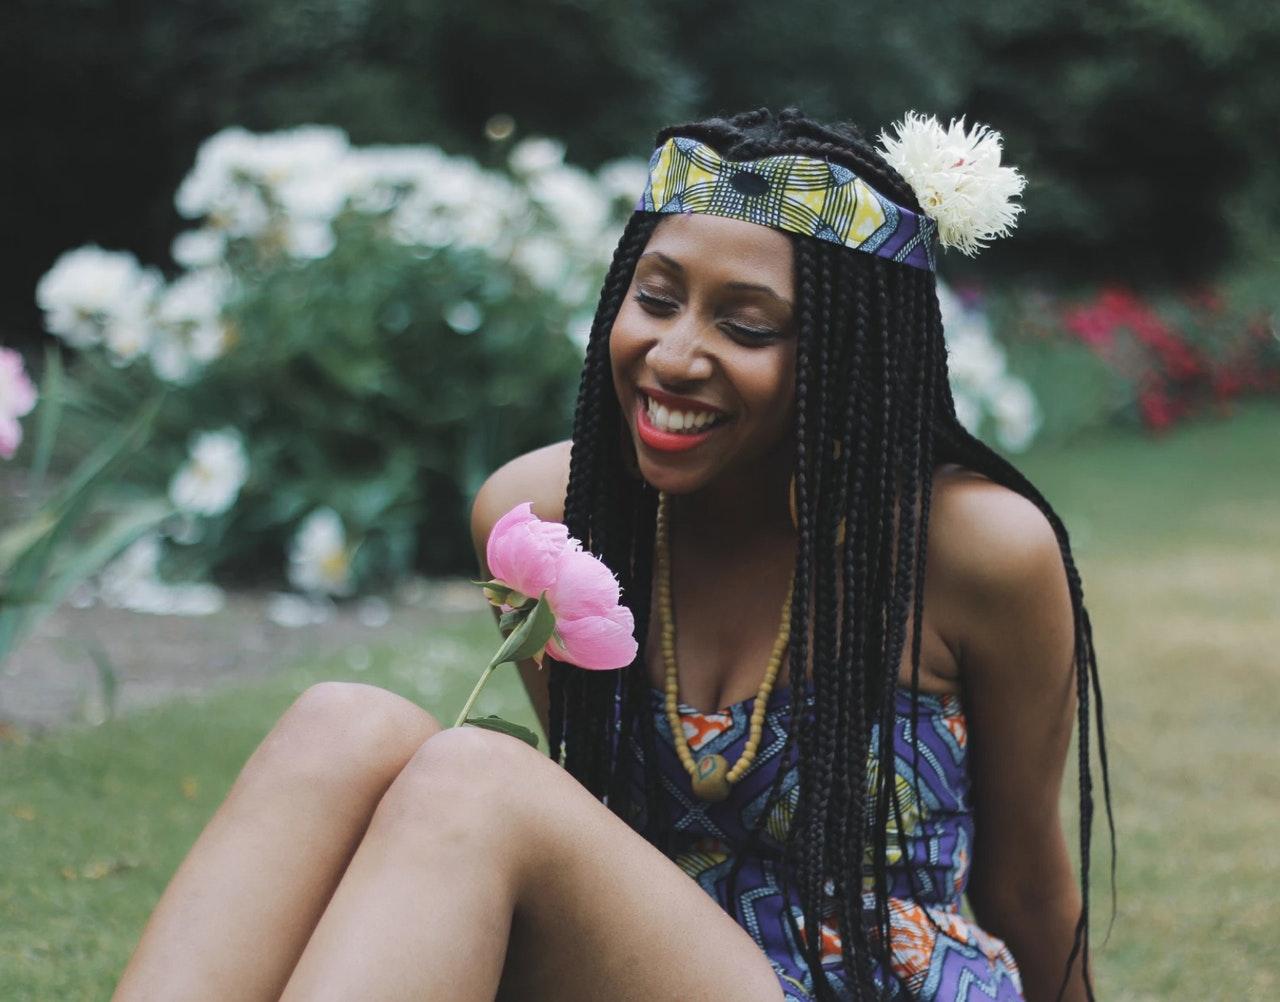 black woman smiling happy